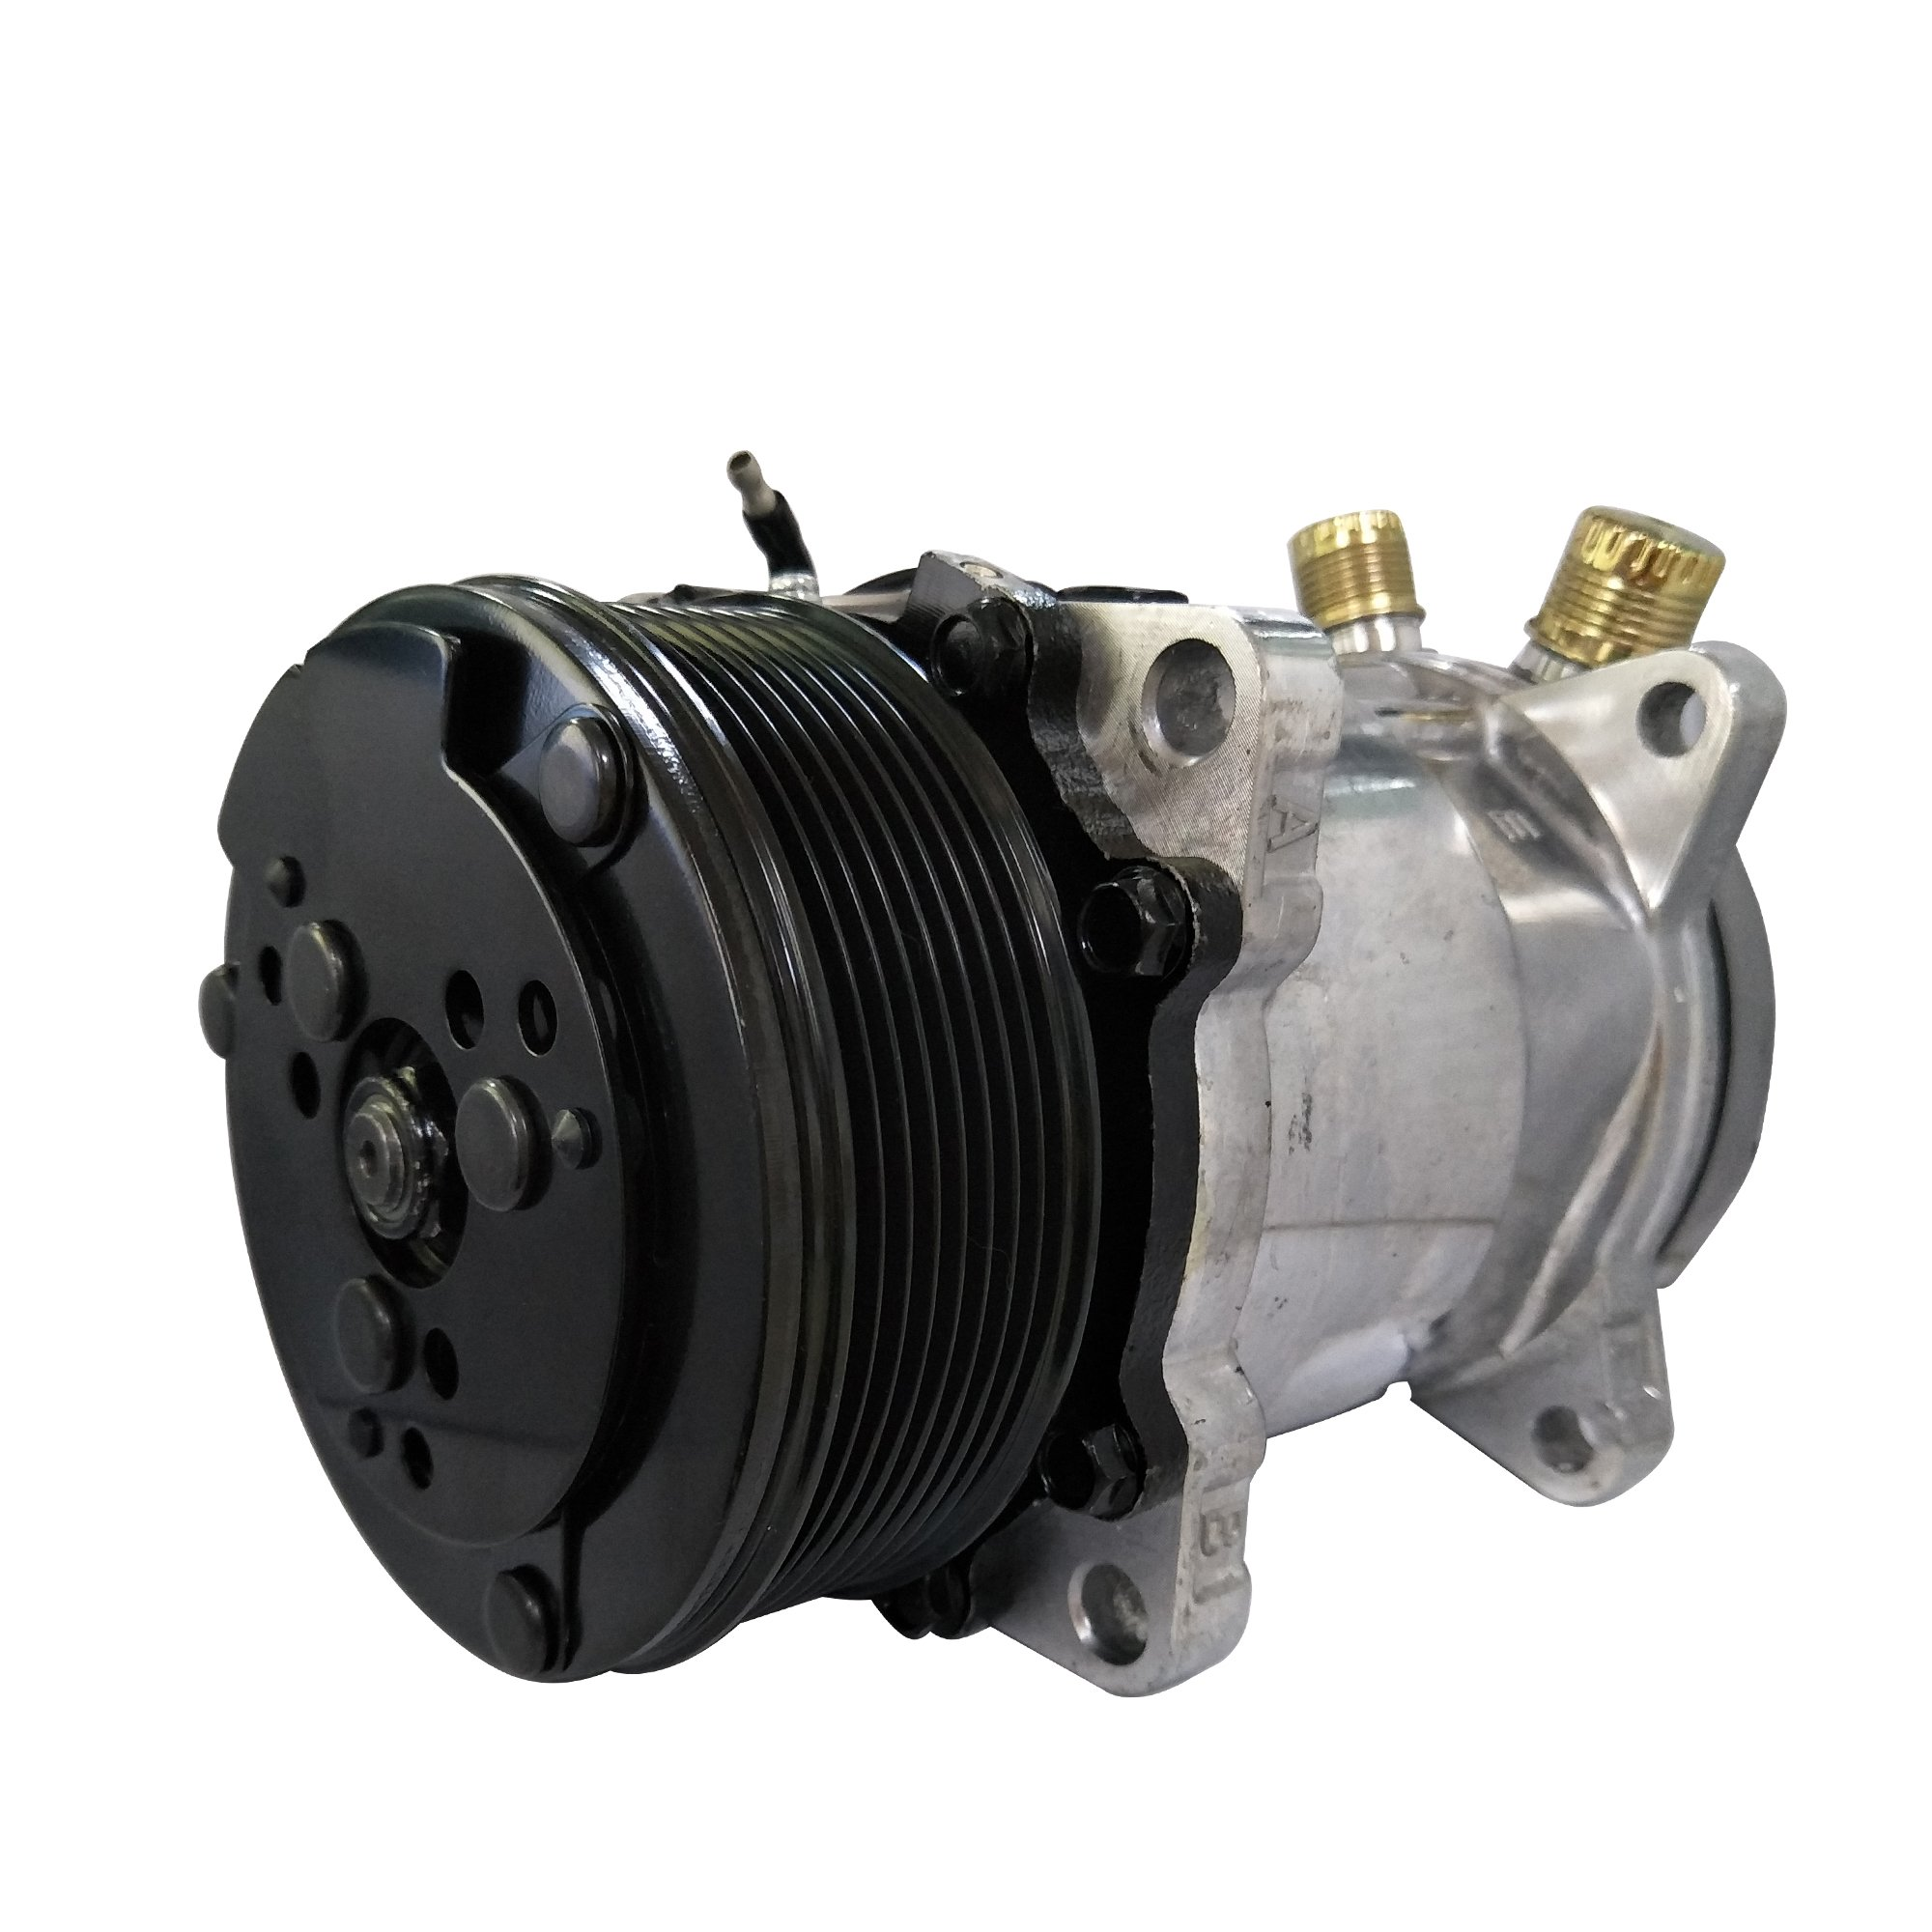 ACTECmax A//C Compressor Black PV7 Clutch SD508 Style 5H14 R134A Serpentine Belt